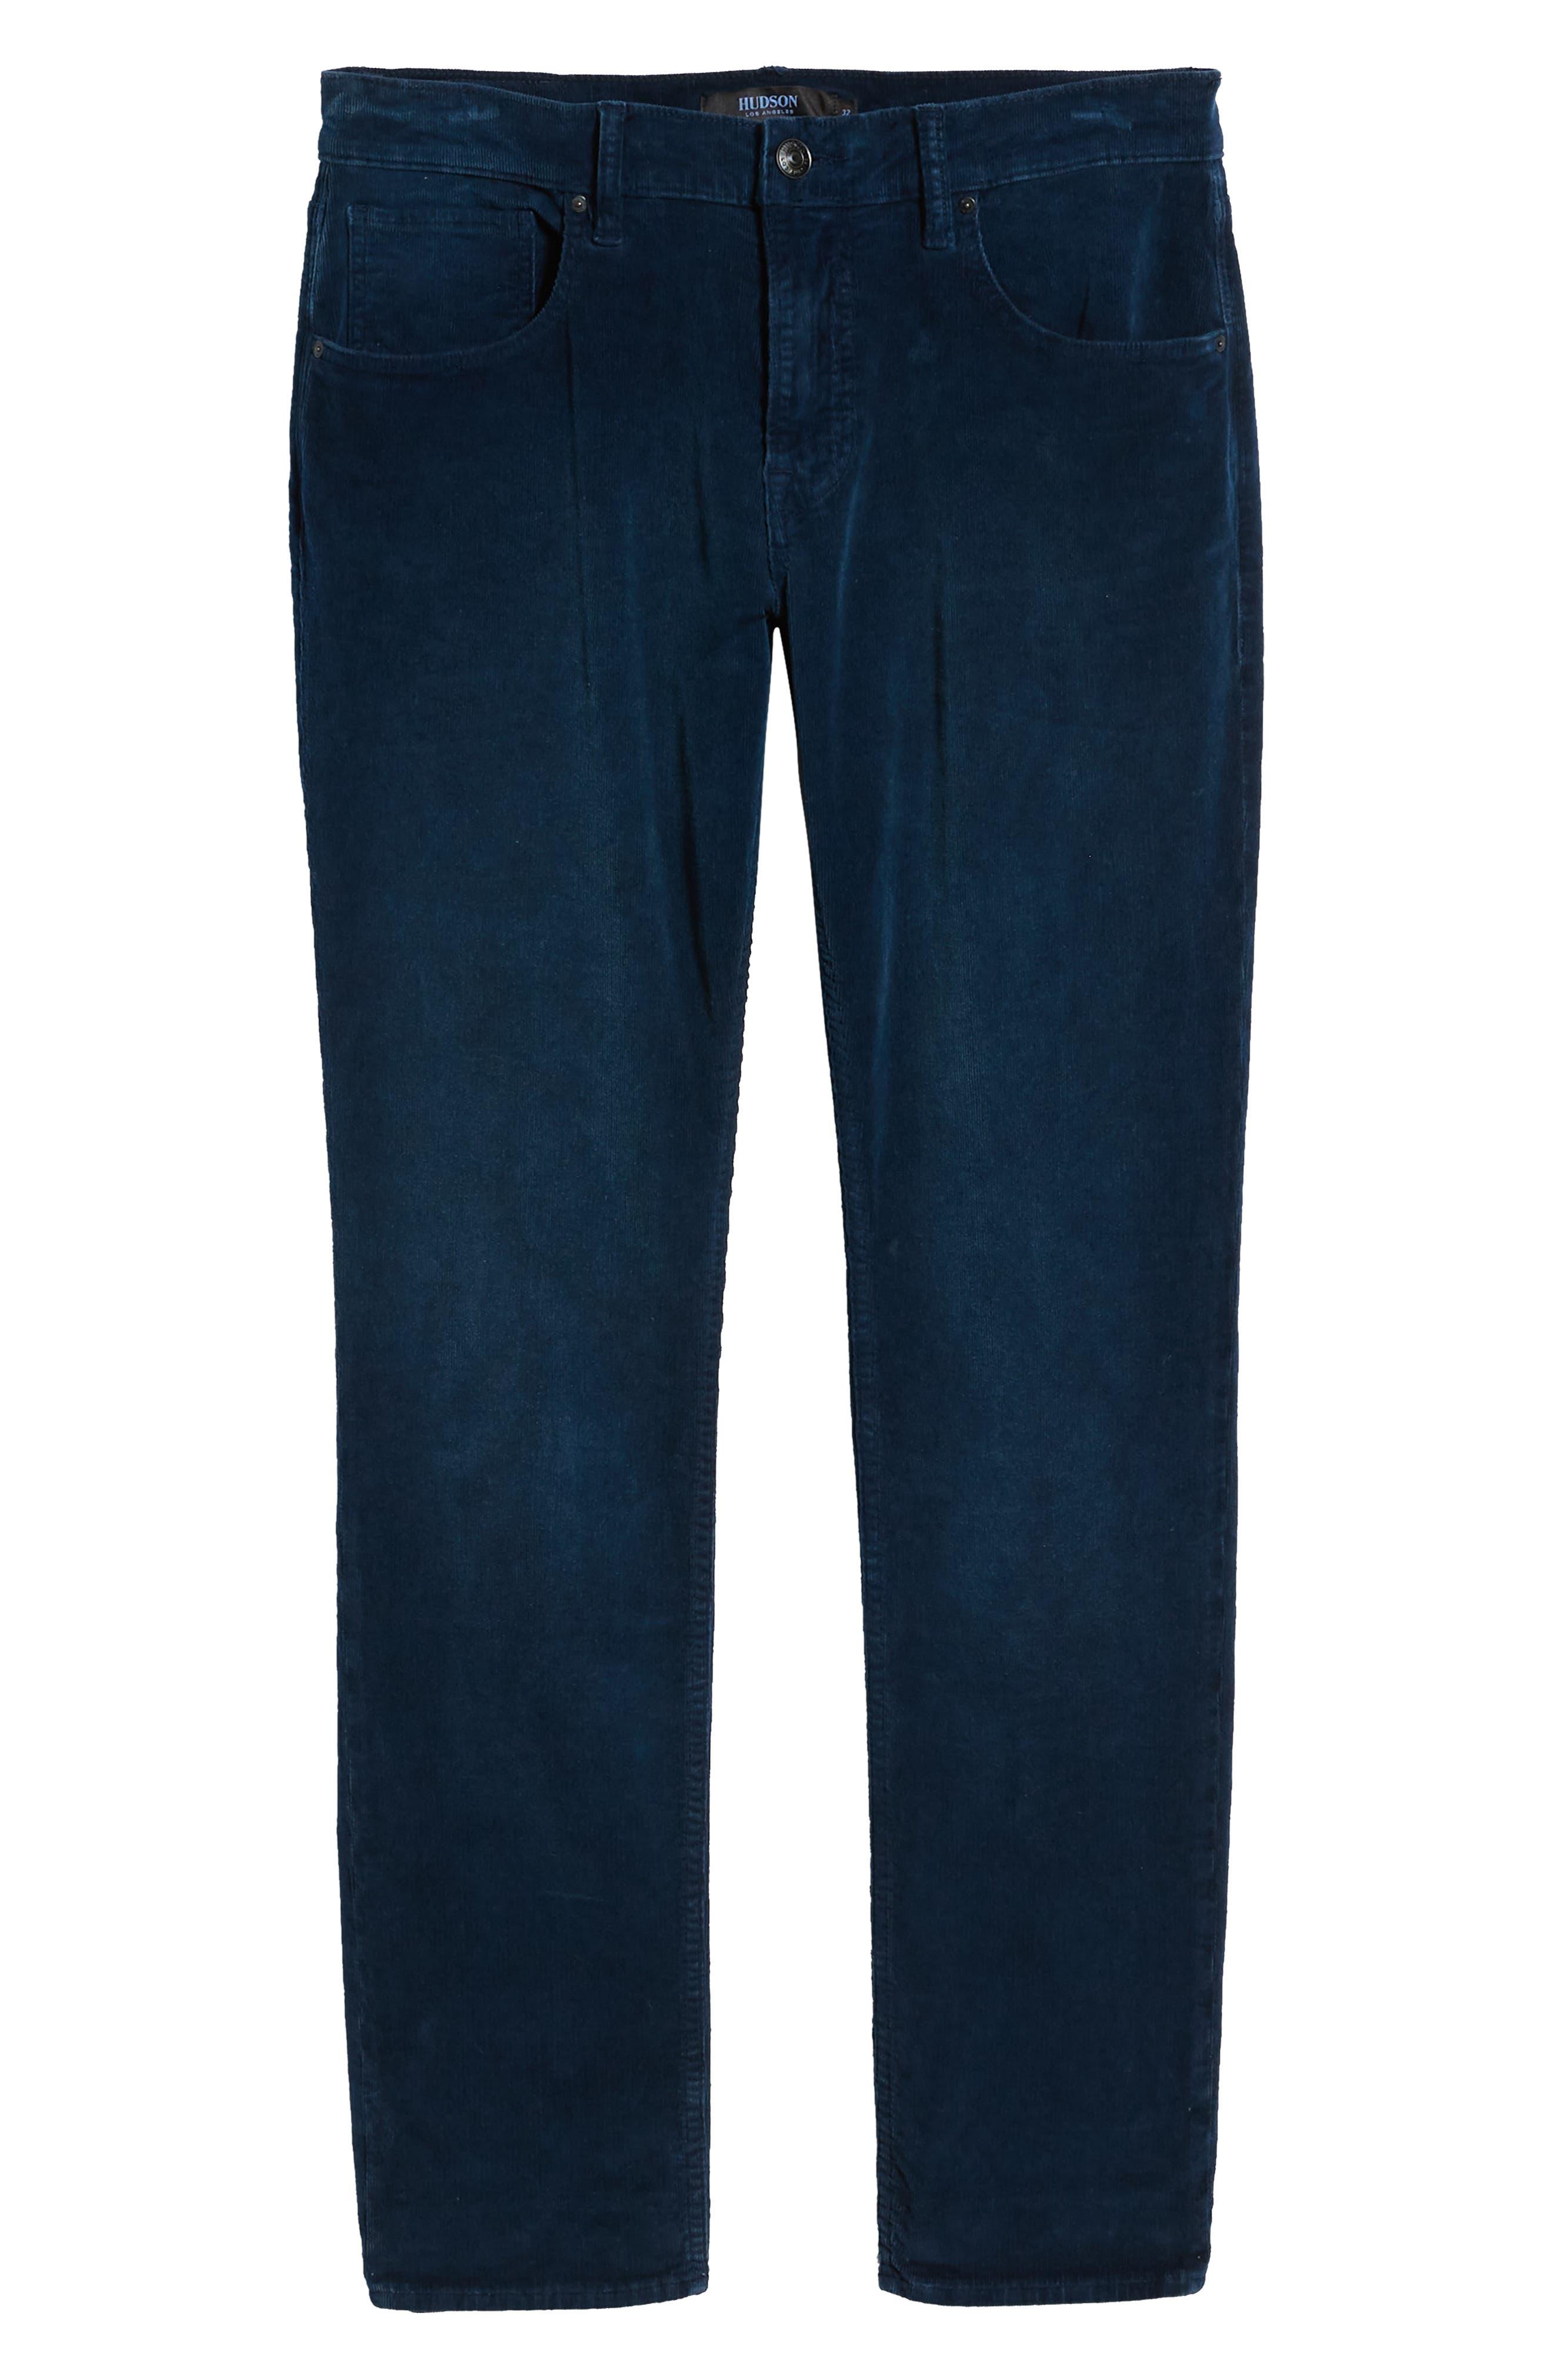 Blake Slim Fit Straight Leg Corduroy Pants,                             Alternate thumbnail 6, color,                             BLACK